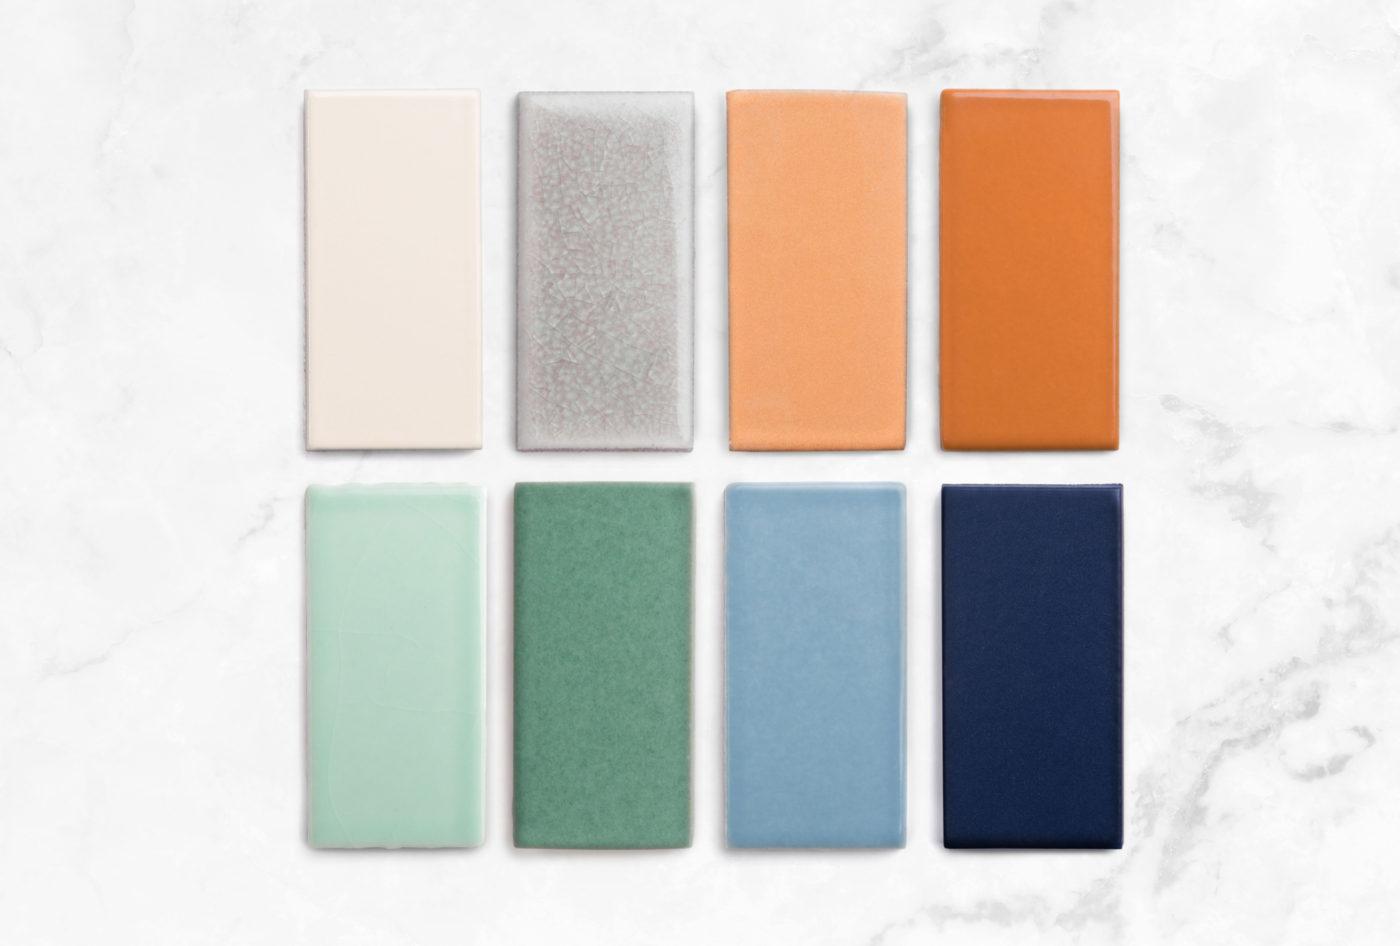 2020 Q3 Noz Design Pack Milky Way Merino Sorbet Bryce Canyon Glacier Bay Tidewater Caribbean Blue Velvet